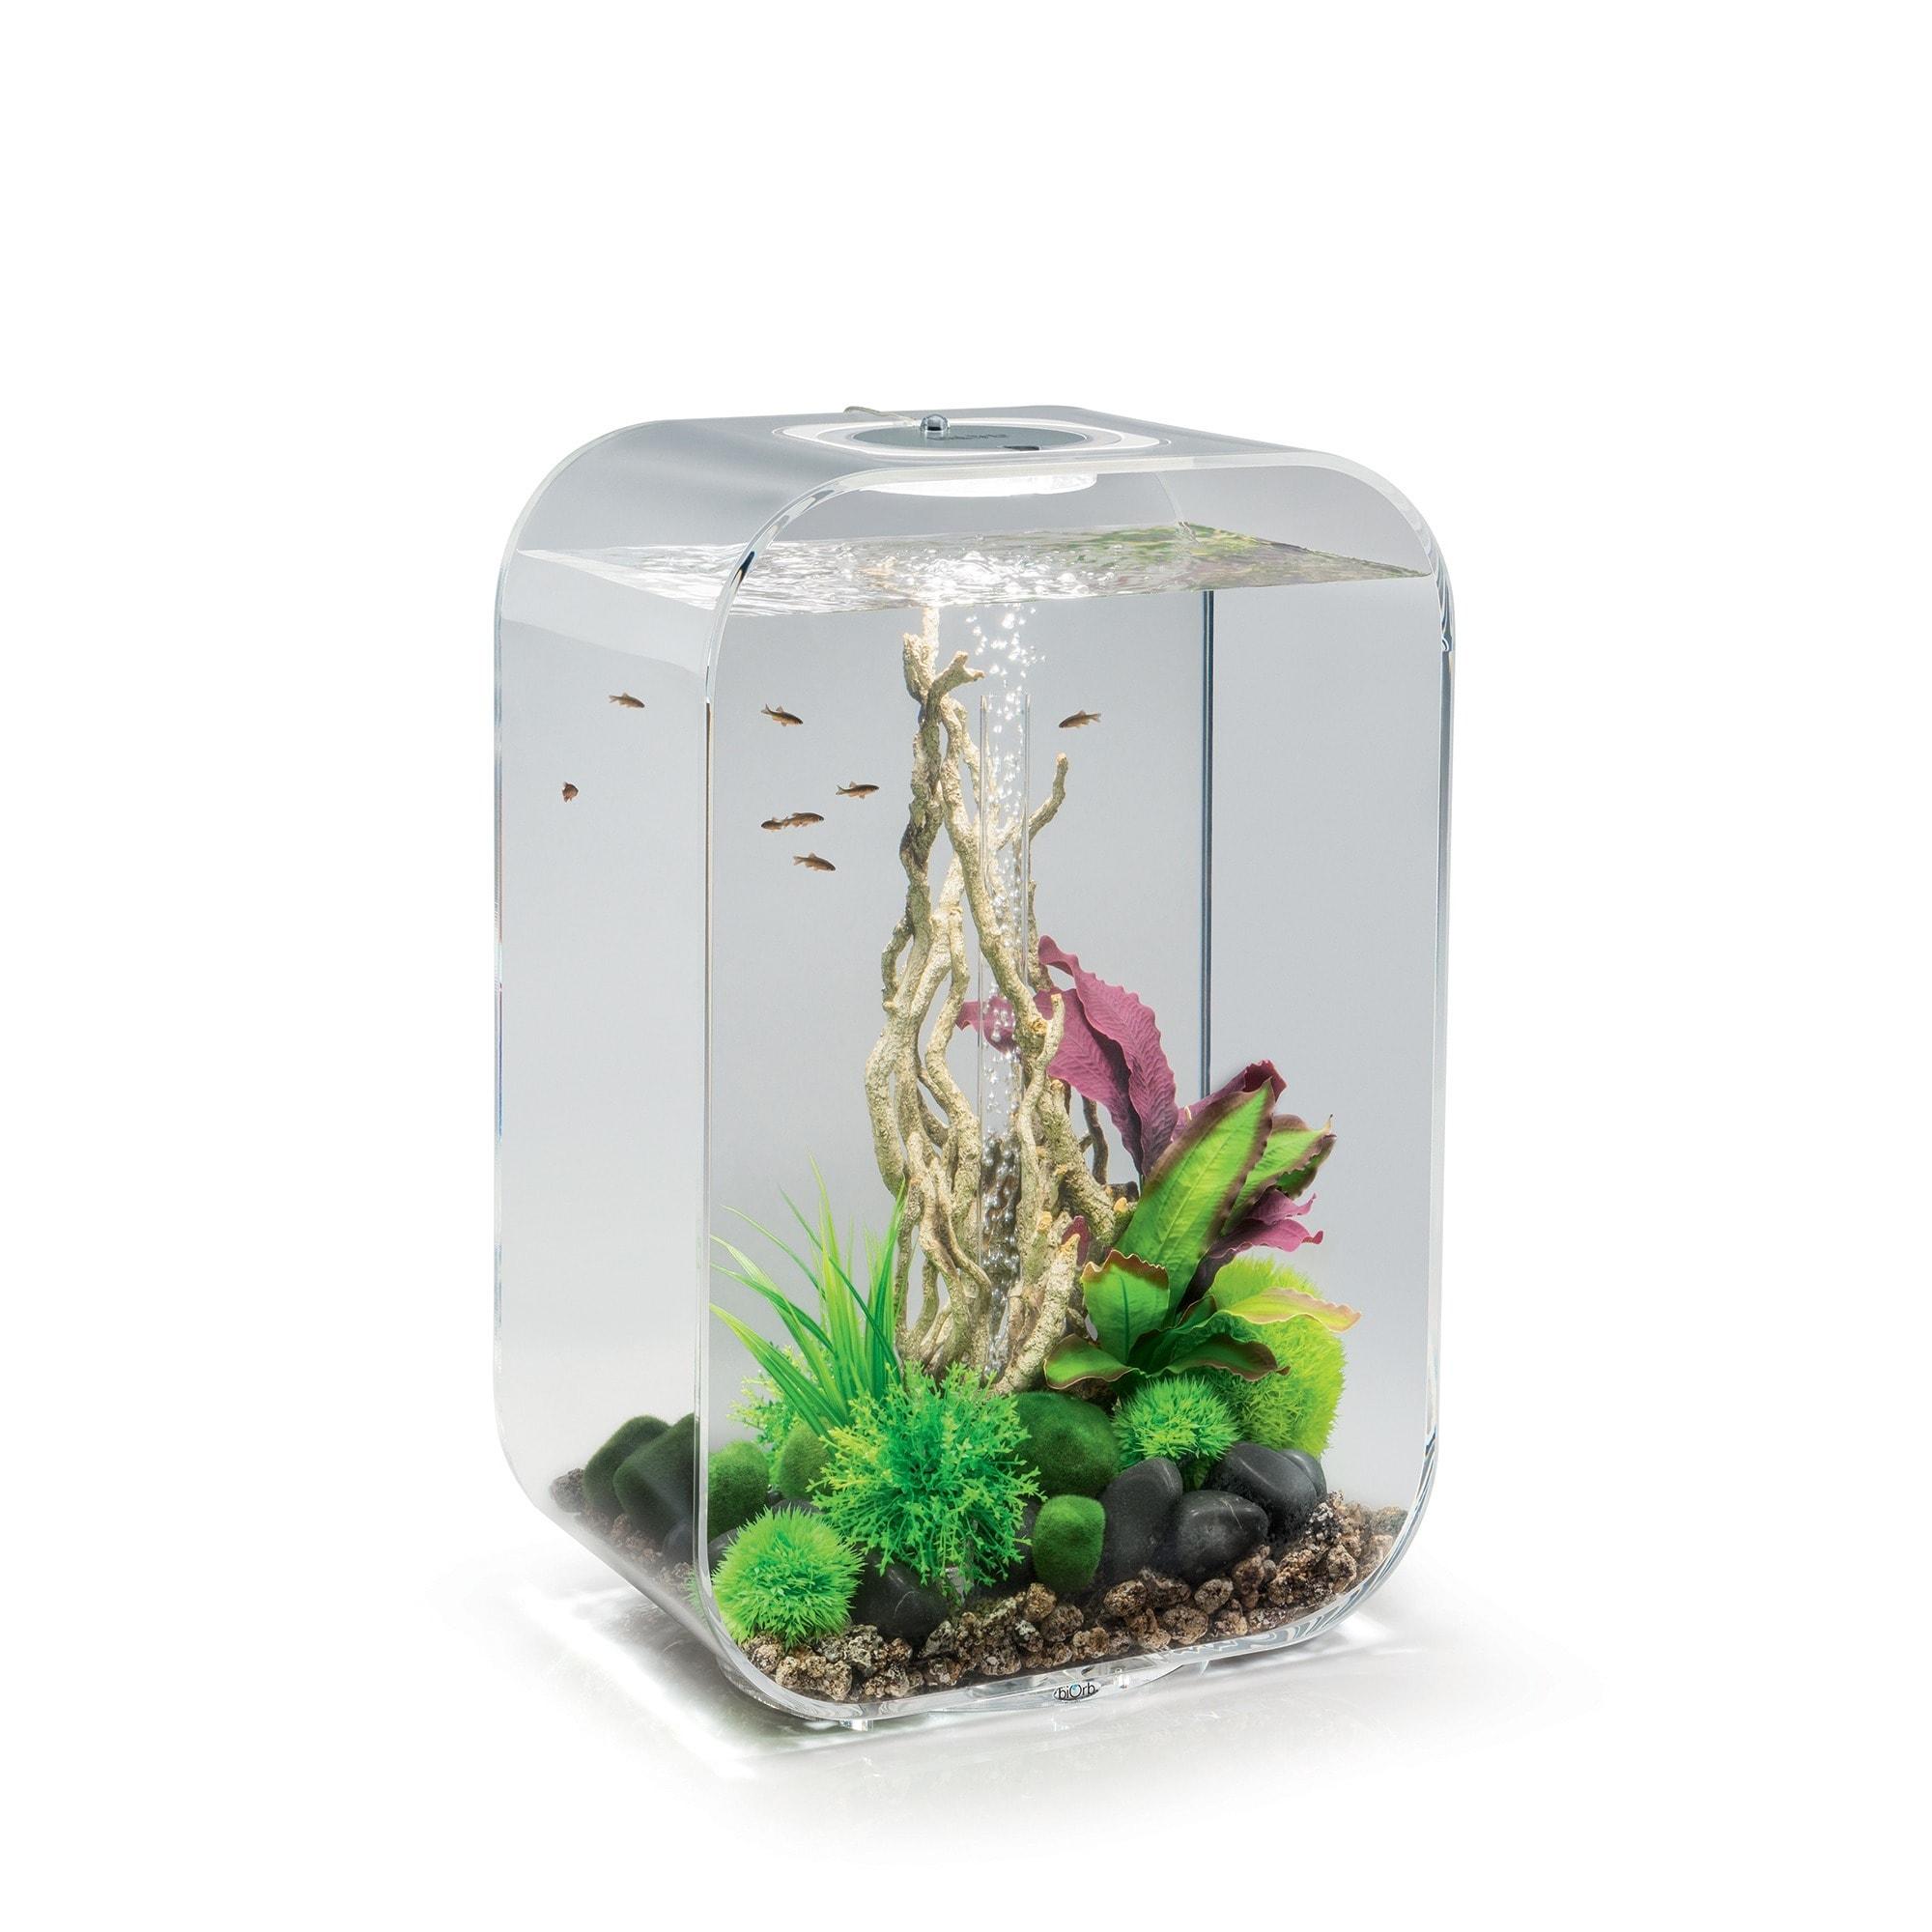 biOrb Life 45 Clear Aquarium (Life 45 MCR Clear), Size 11...